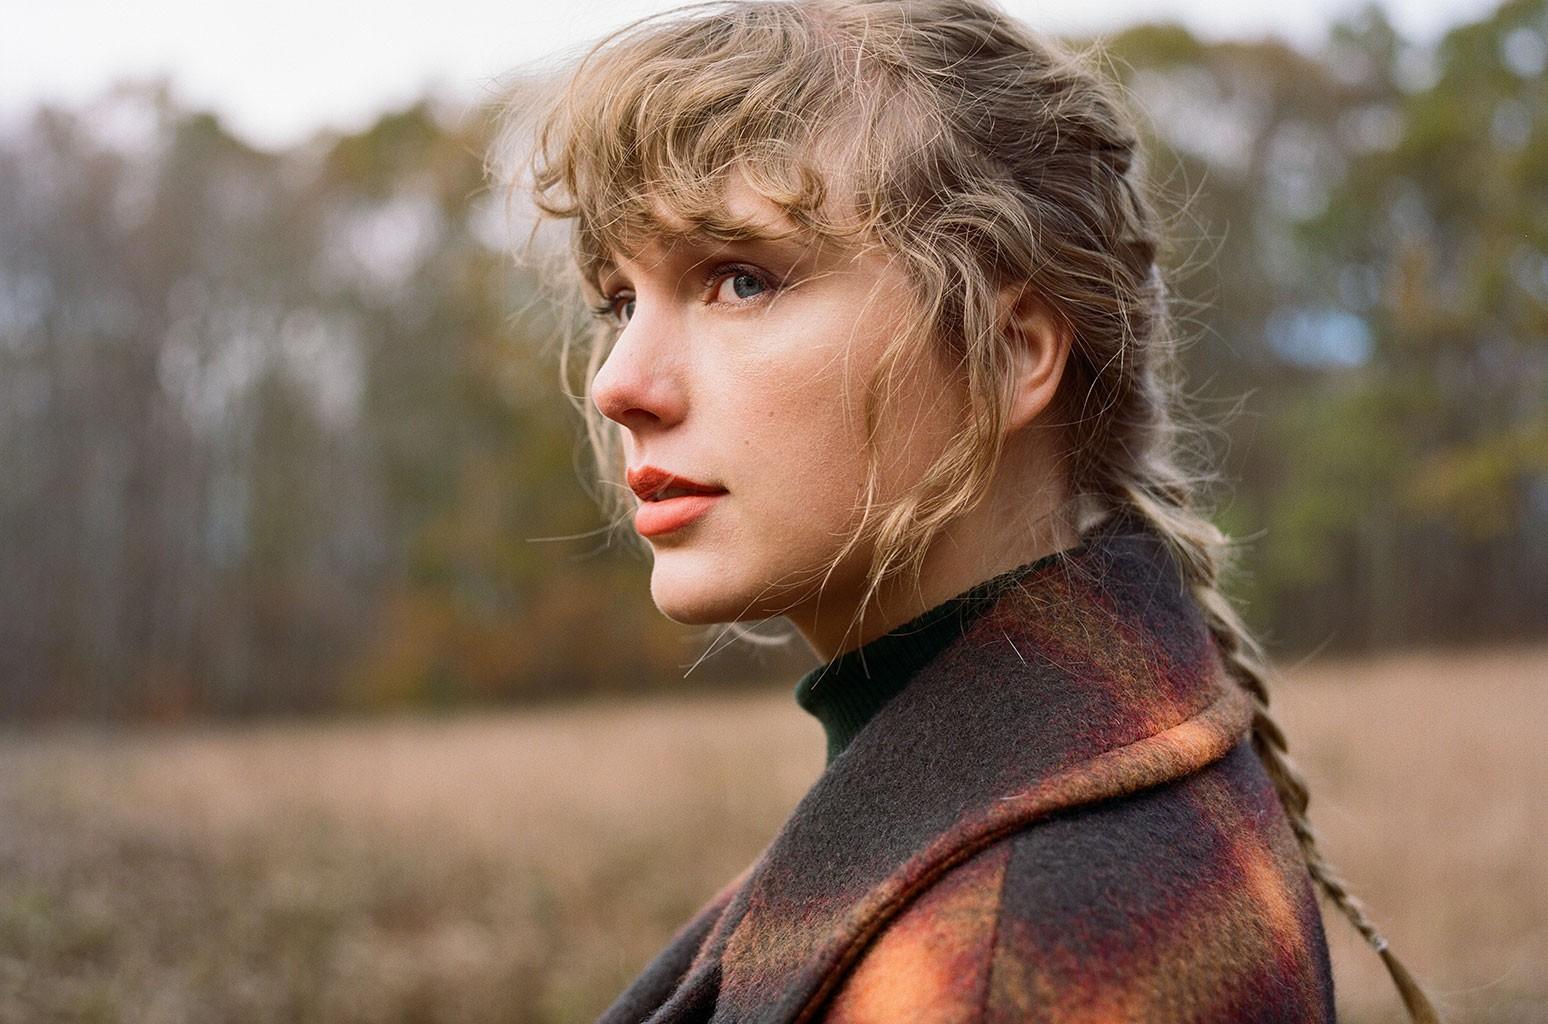 "Taylor Swift izbacila novi album / Oduševila fanove novim albumom ""Evermore"""